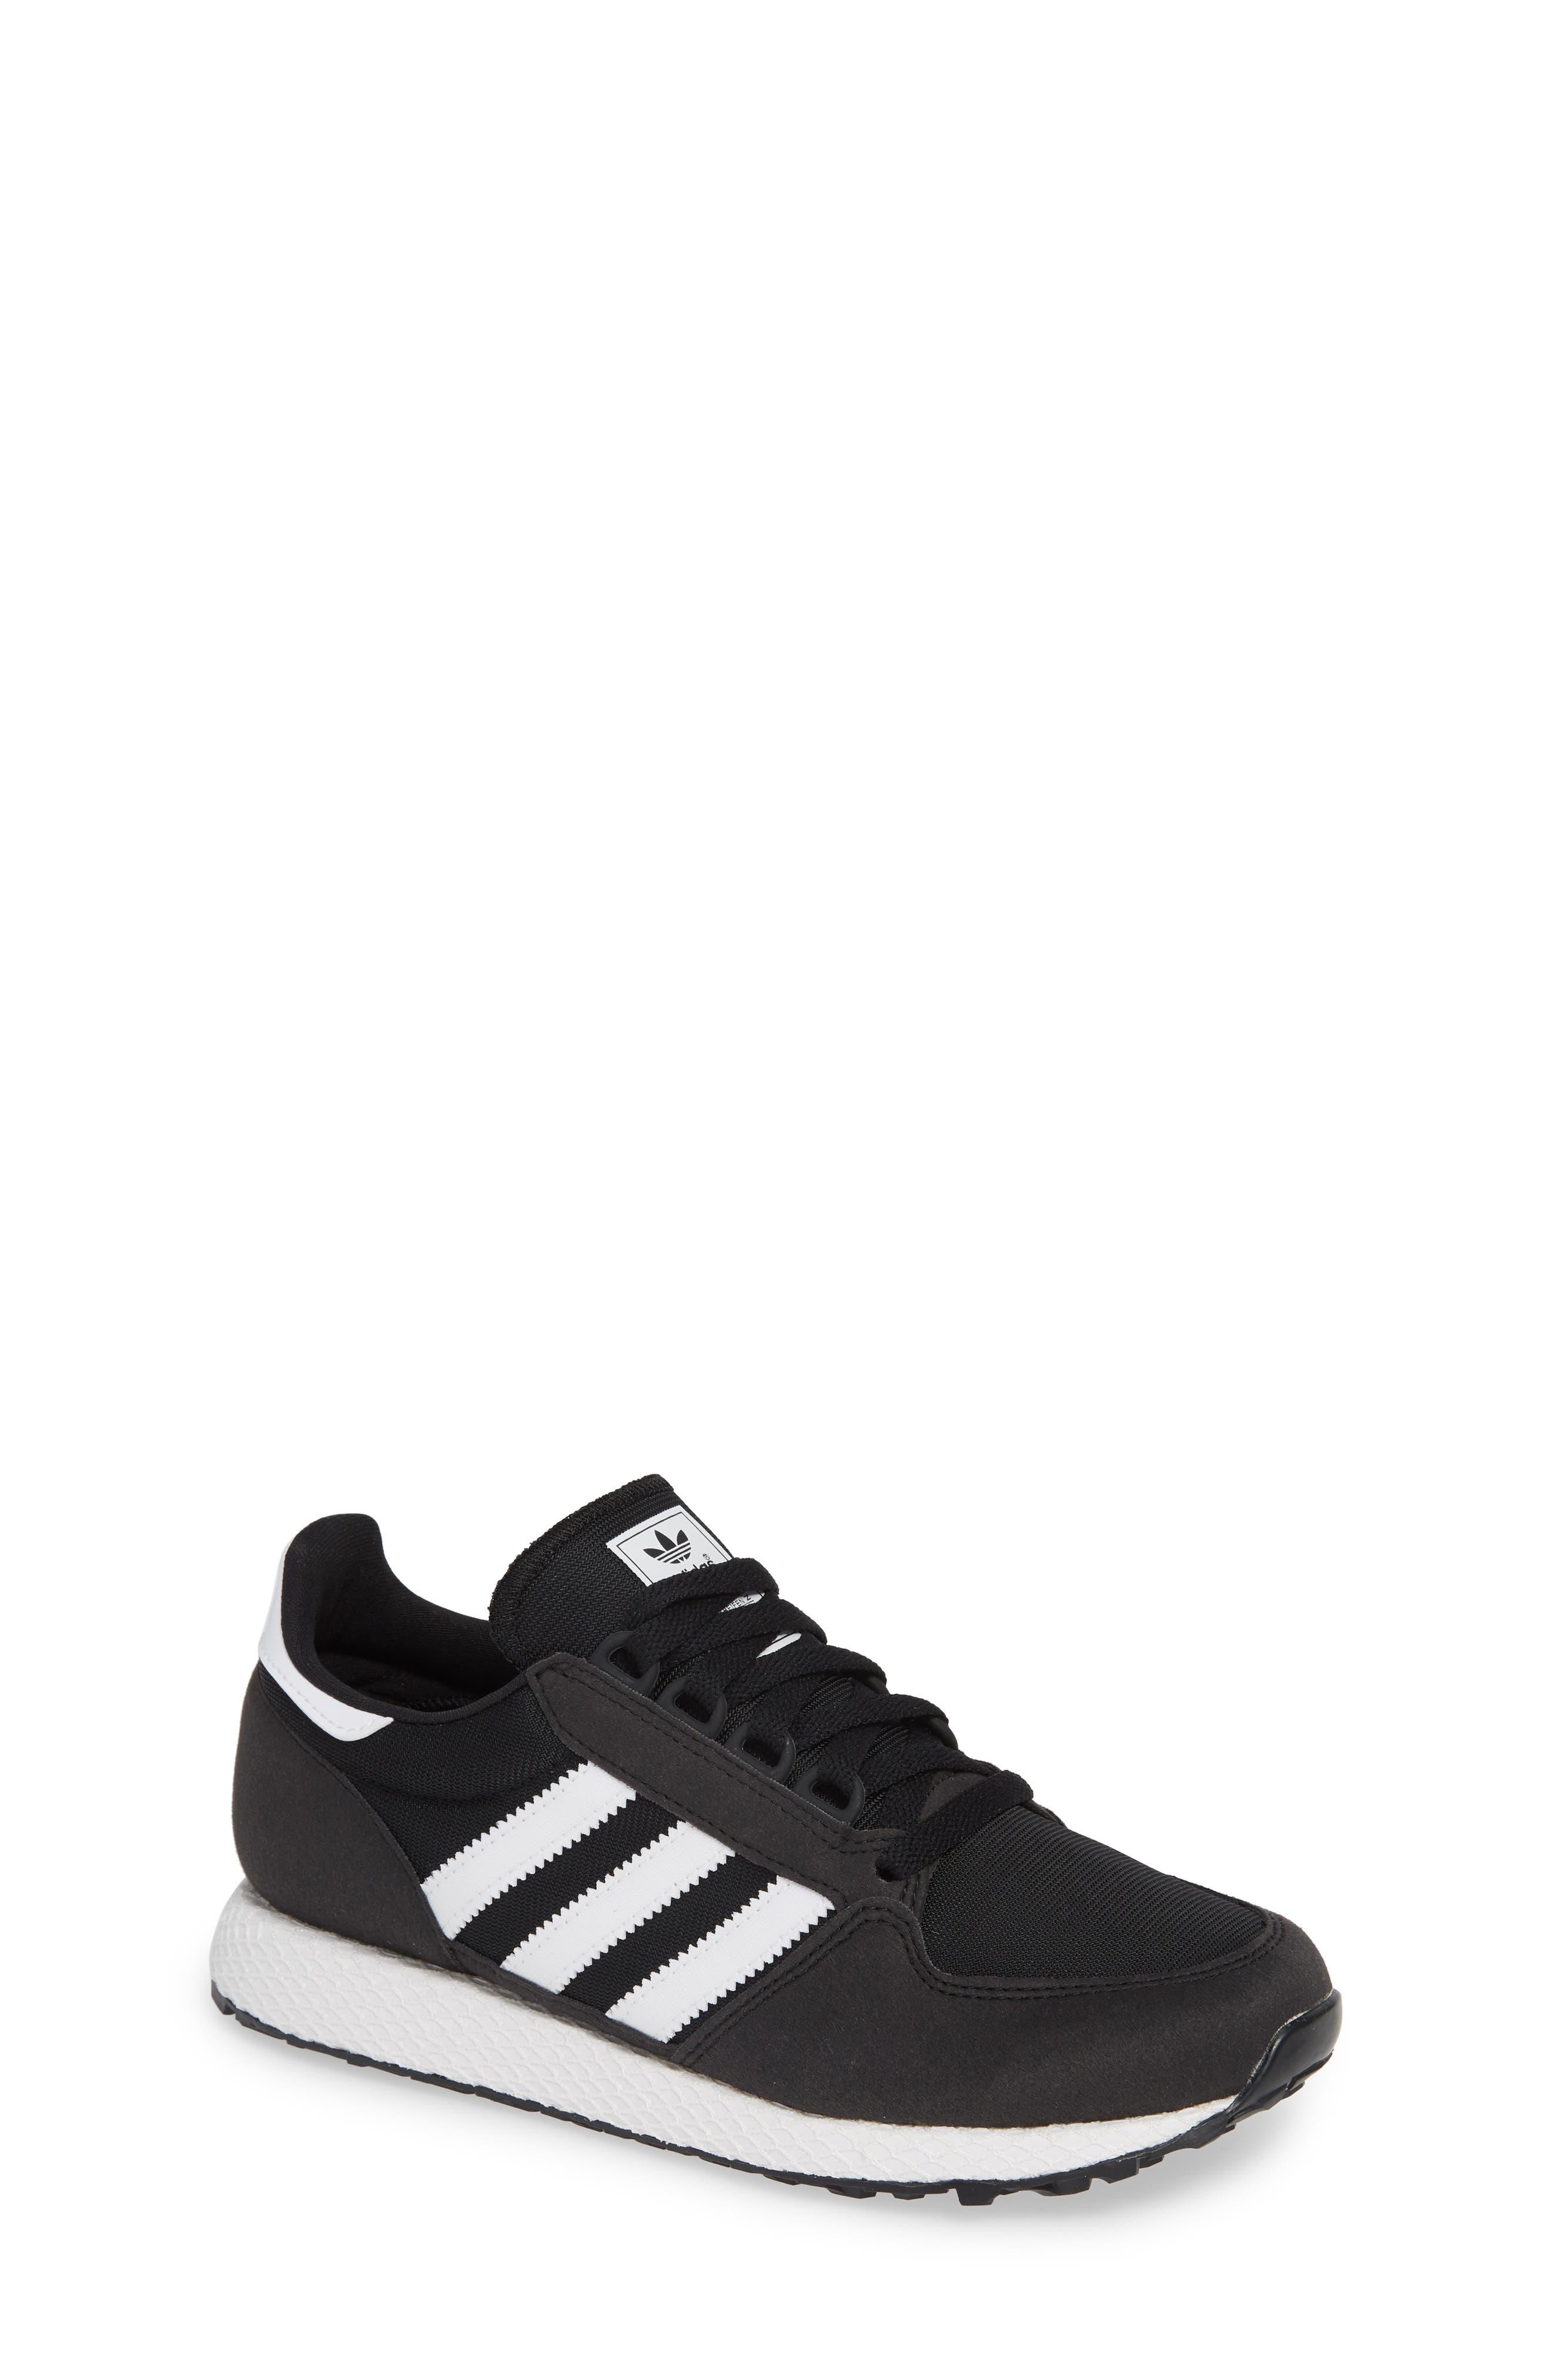 Forest Grove Sneaker,                         Main,                         color, BLACK/ WHITE/ BLACK